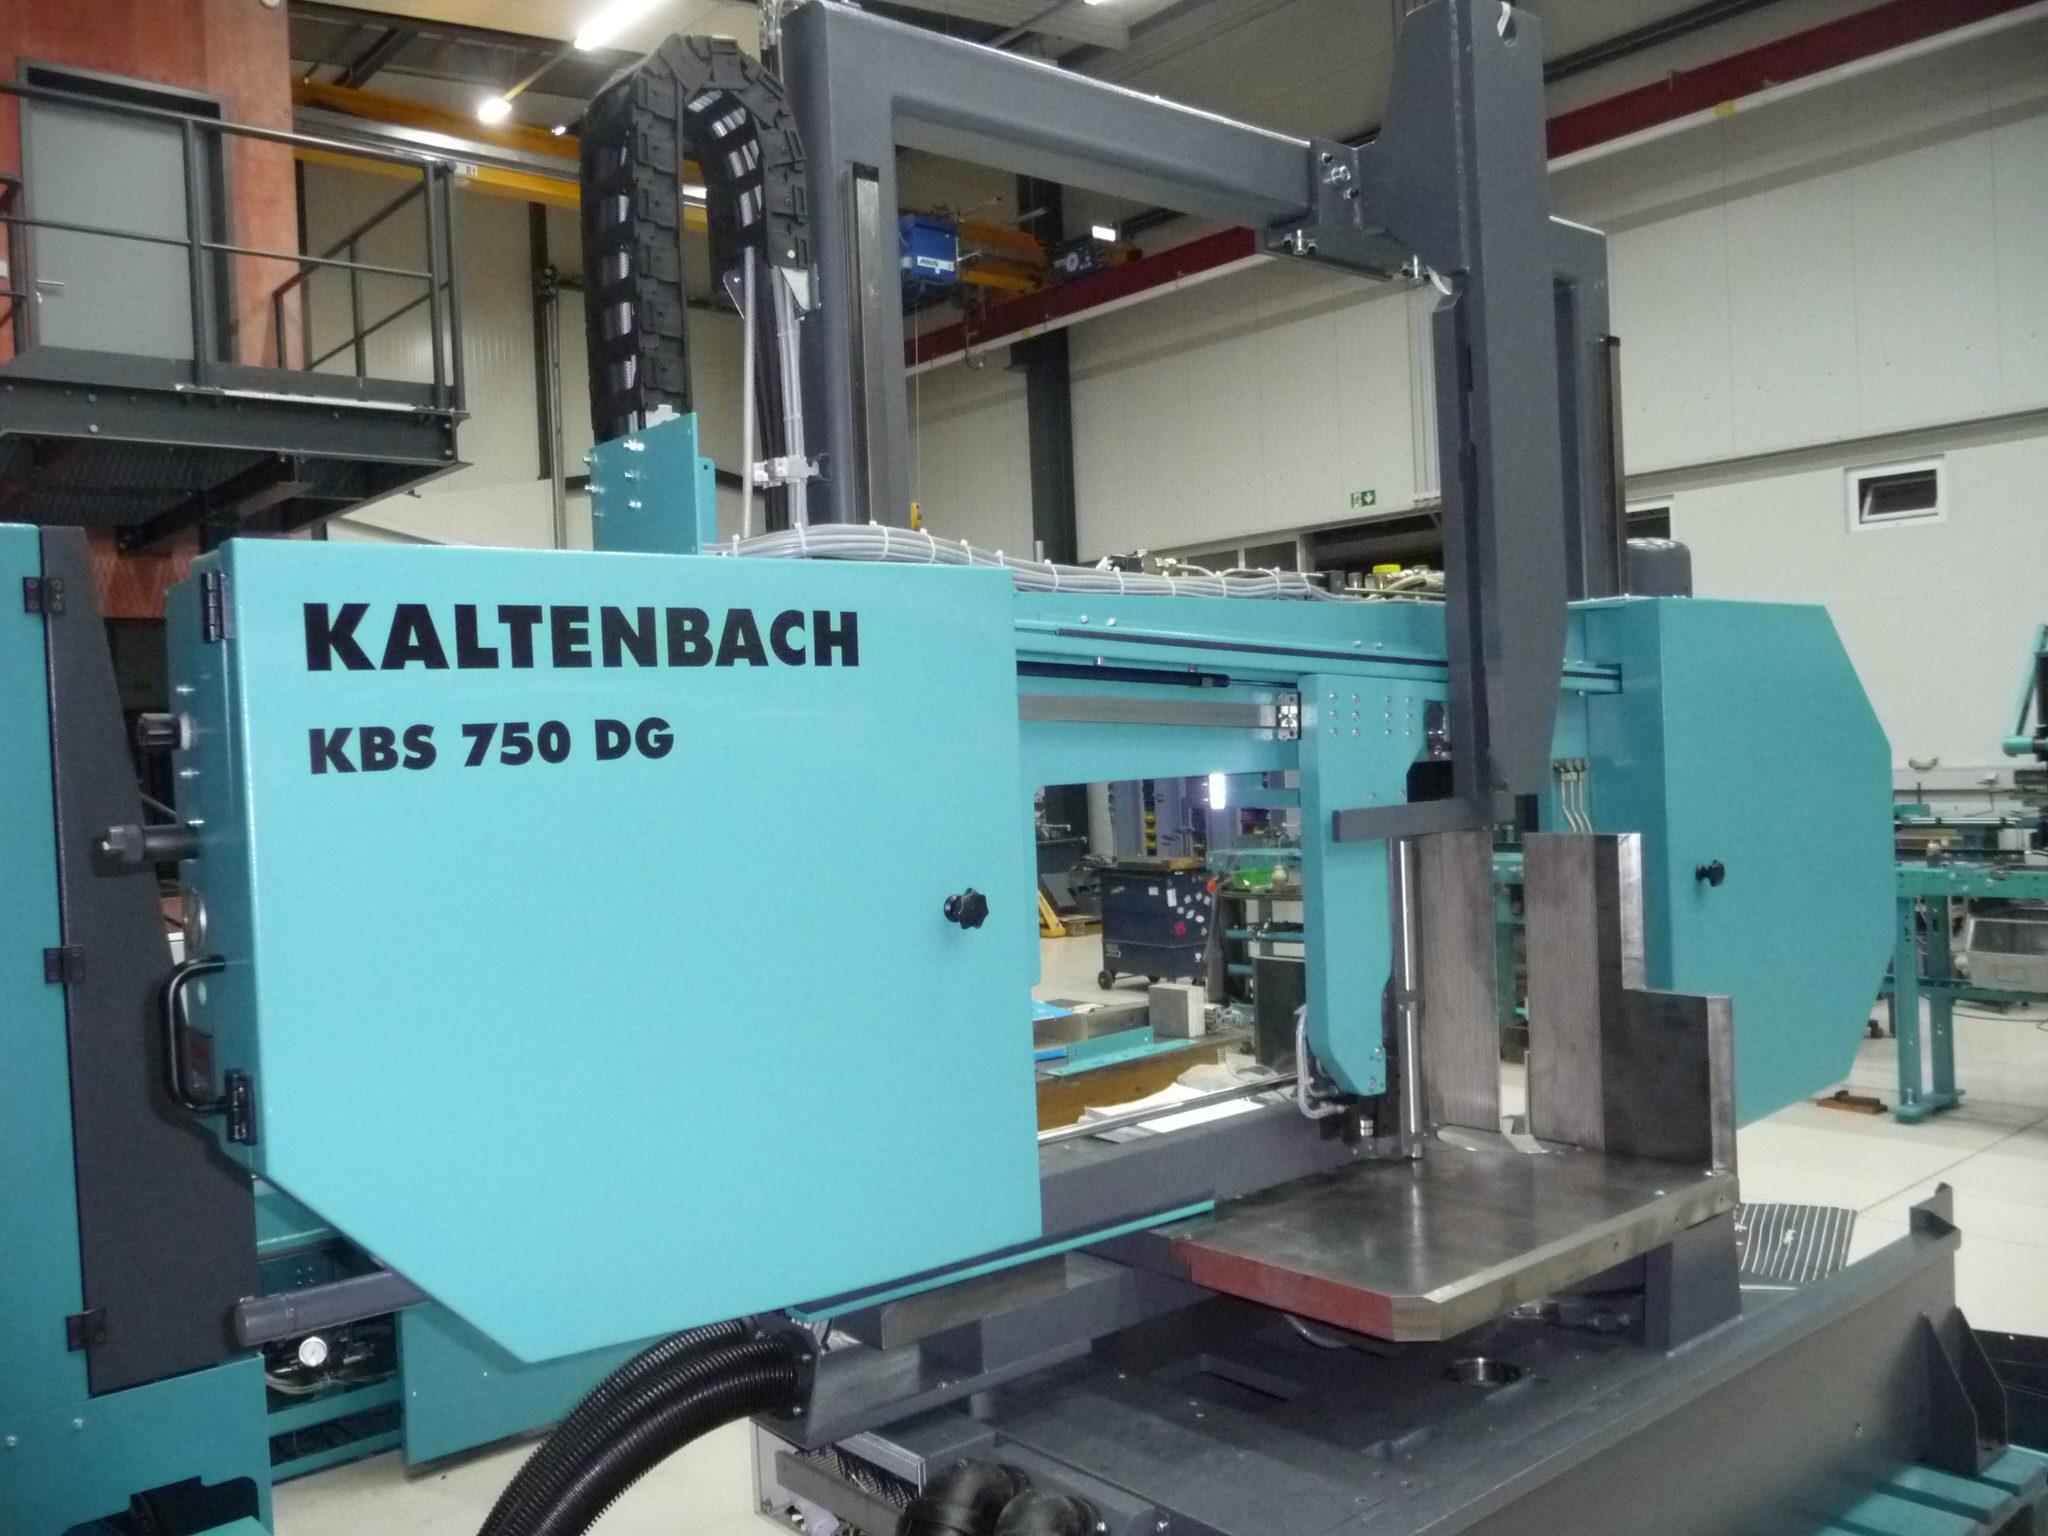 KBS 750 DGNC